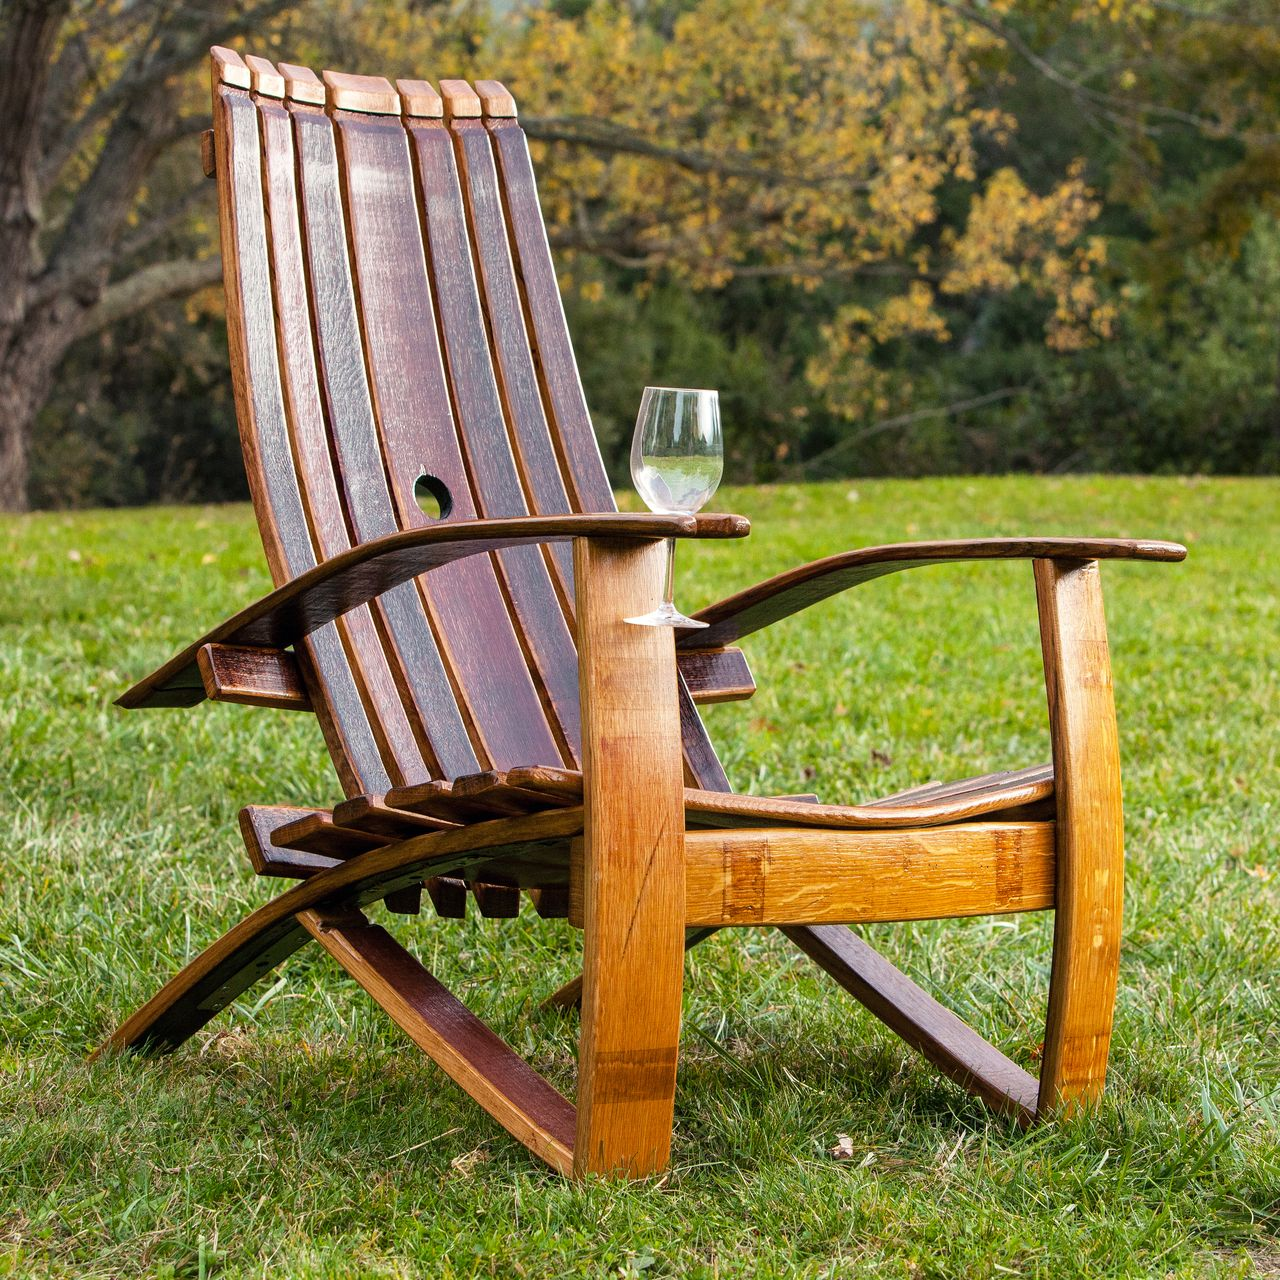 Barrel Stave Adirondack Chair Plans Disney Princess Camping Chairs Pinterest Wine